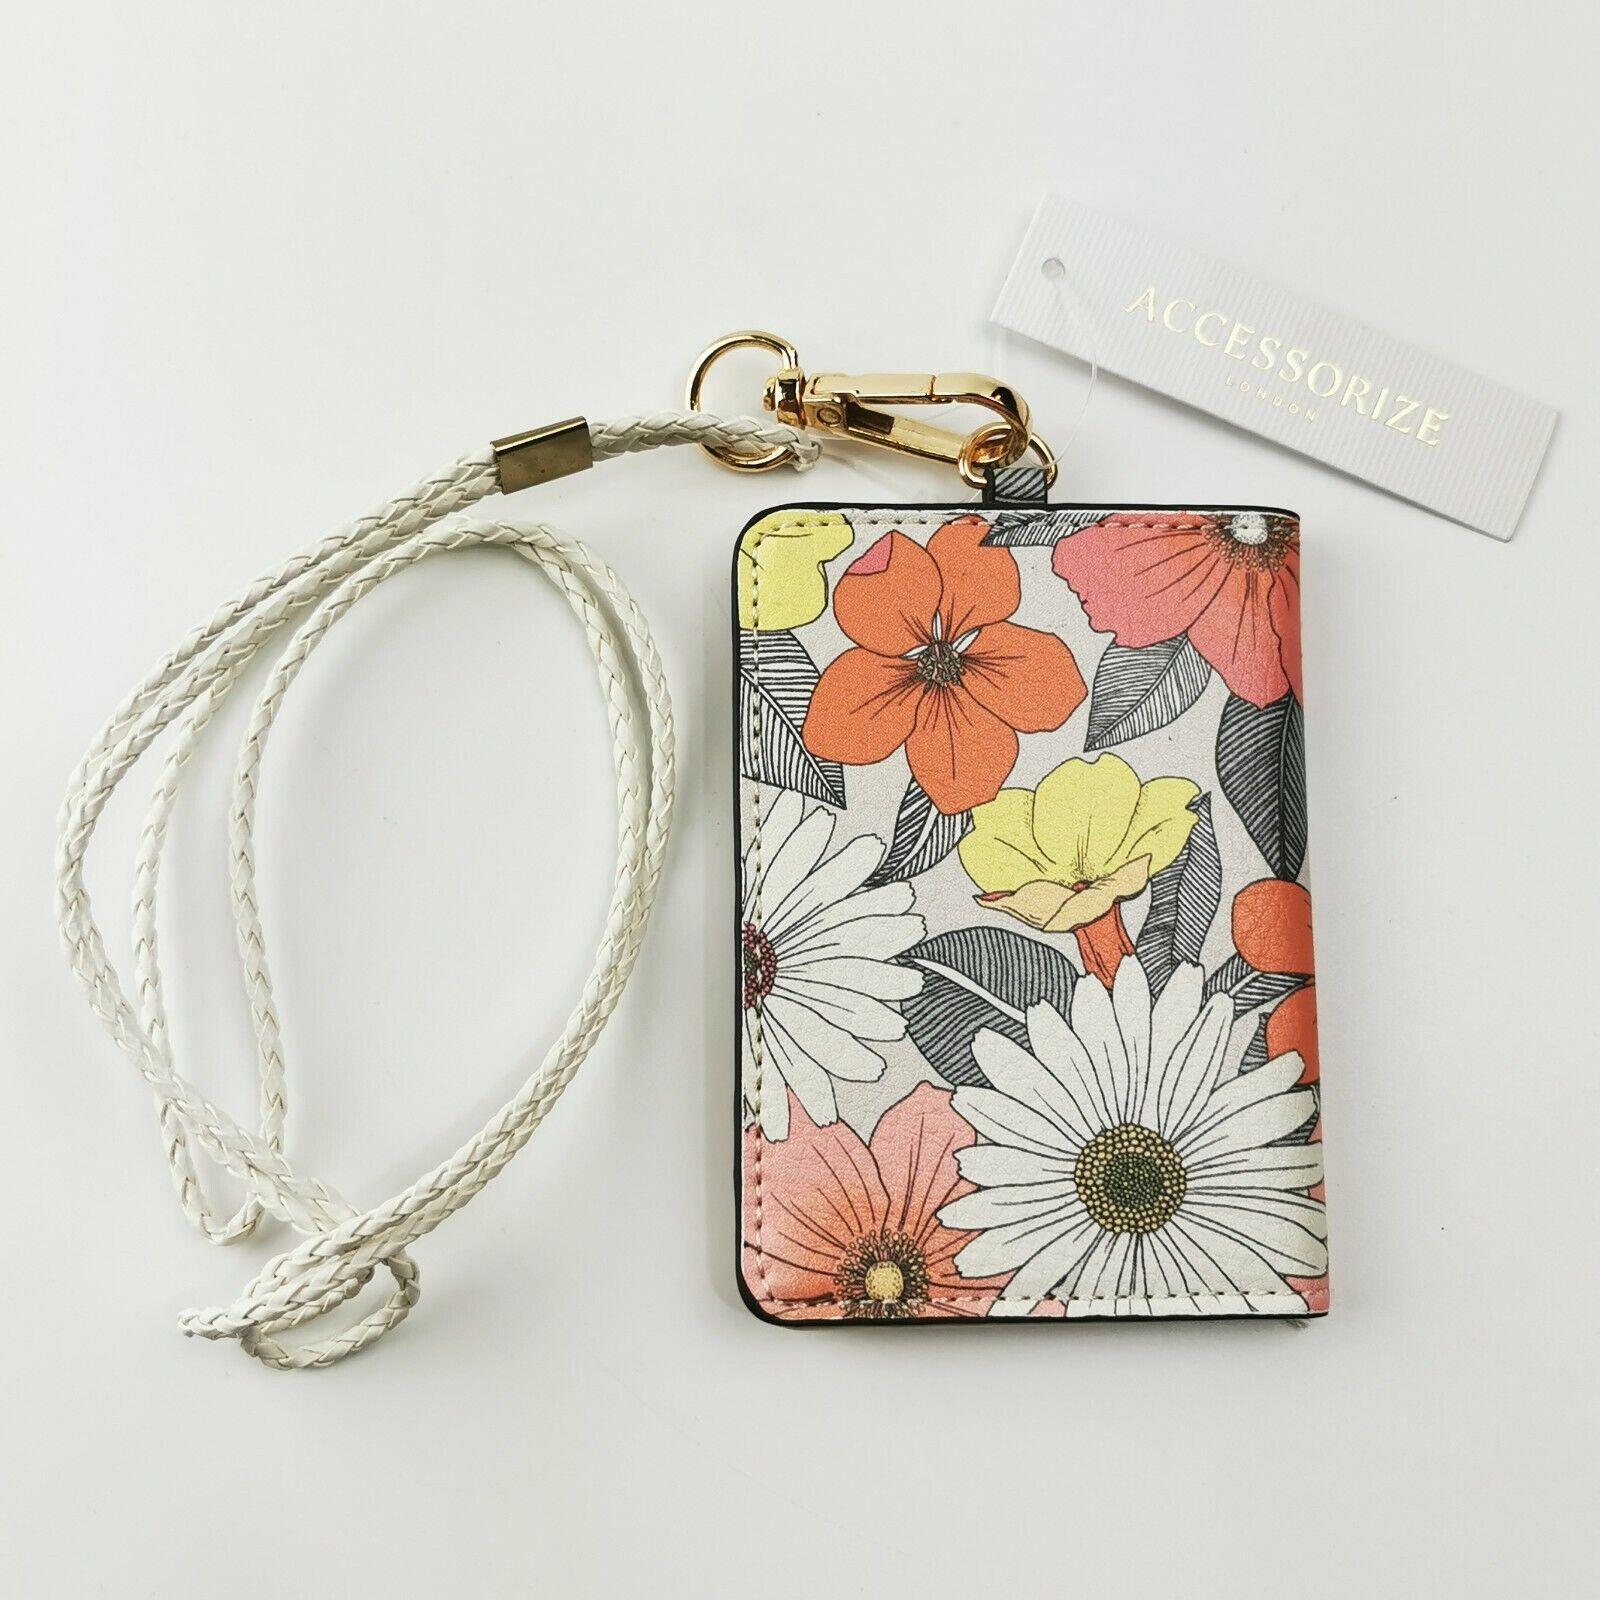 ~ Accessorize ~ Floral Lanyard ~ ID Holder / Wallet / Card Holder ~ Neck Strap ~